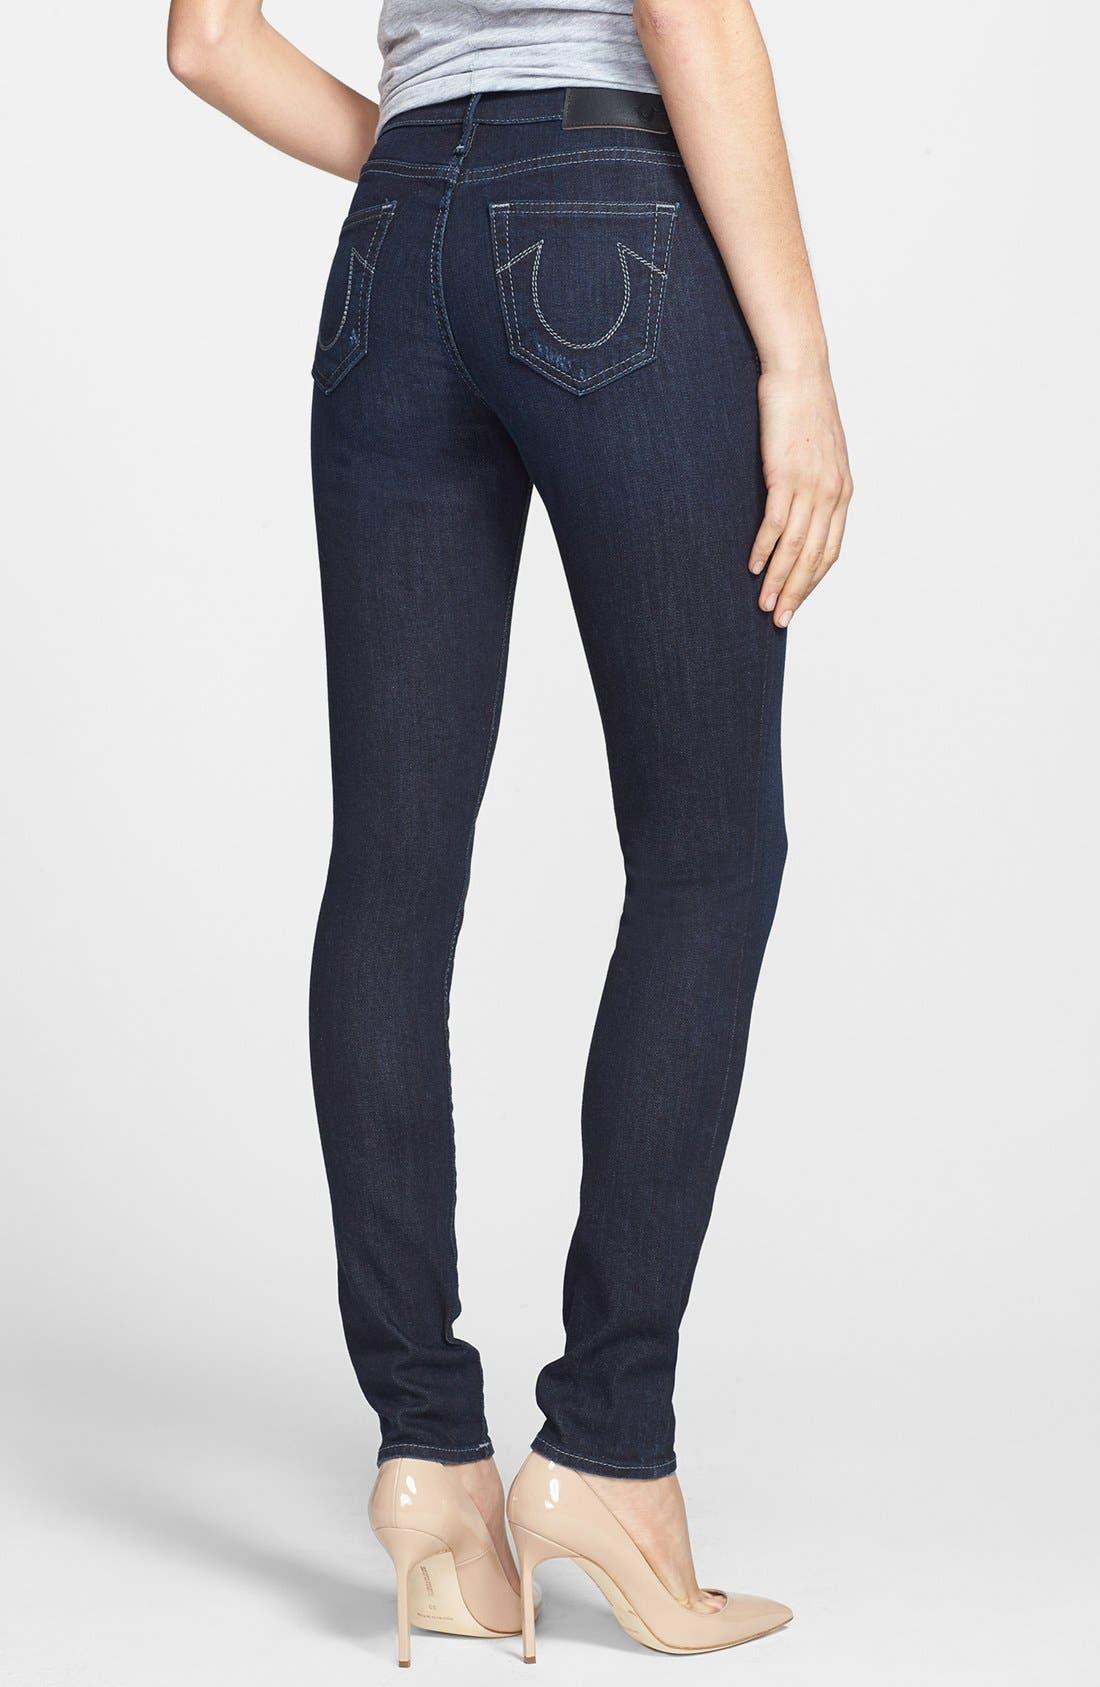 Alternate Image 2  - True Religion Brand Jeans 'Abbey' Super Skinny Jeans (Baltic Ink)